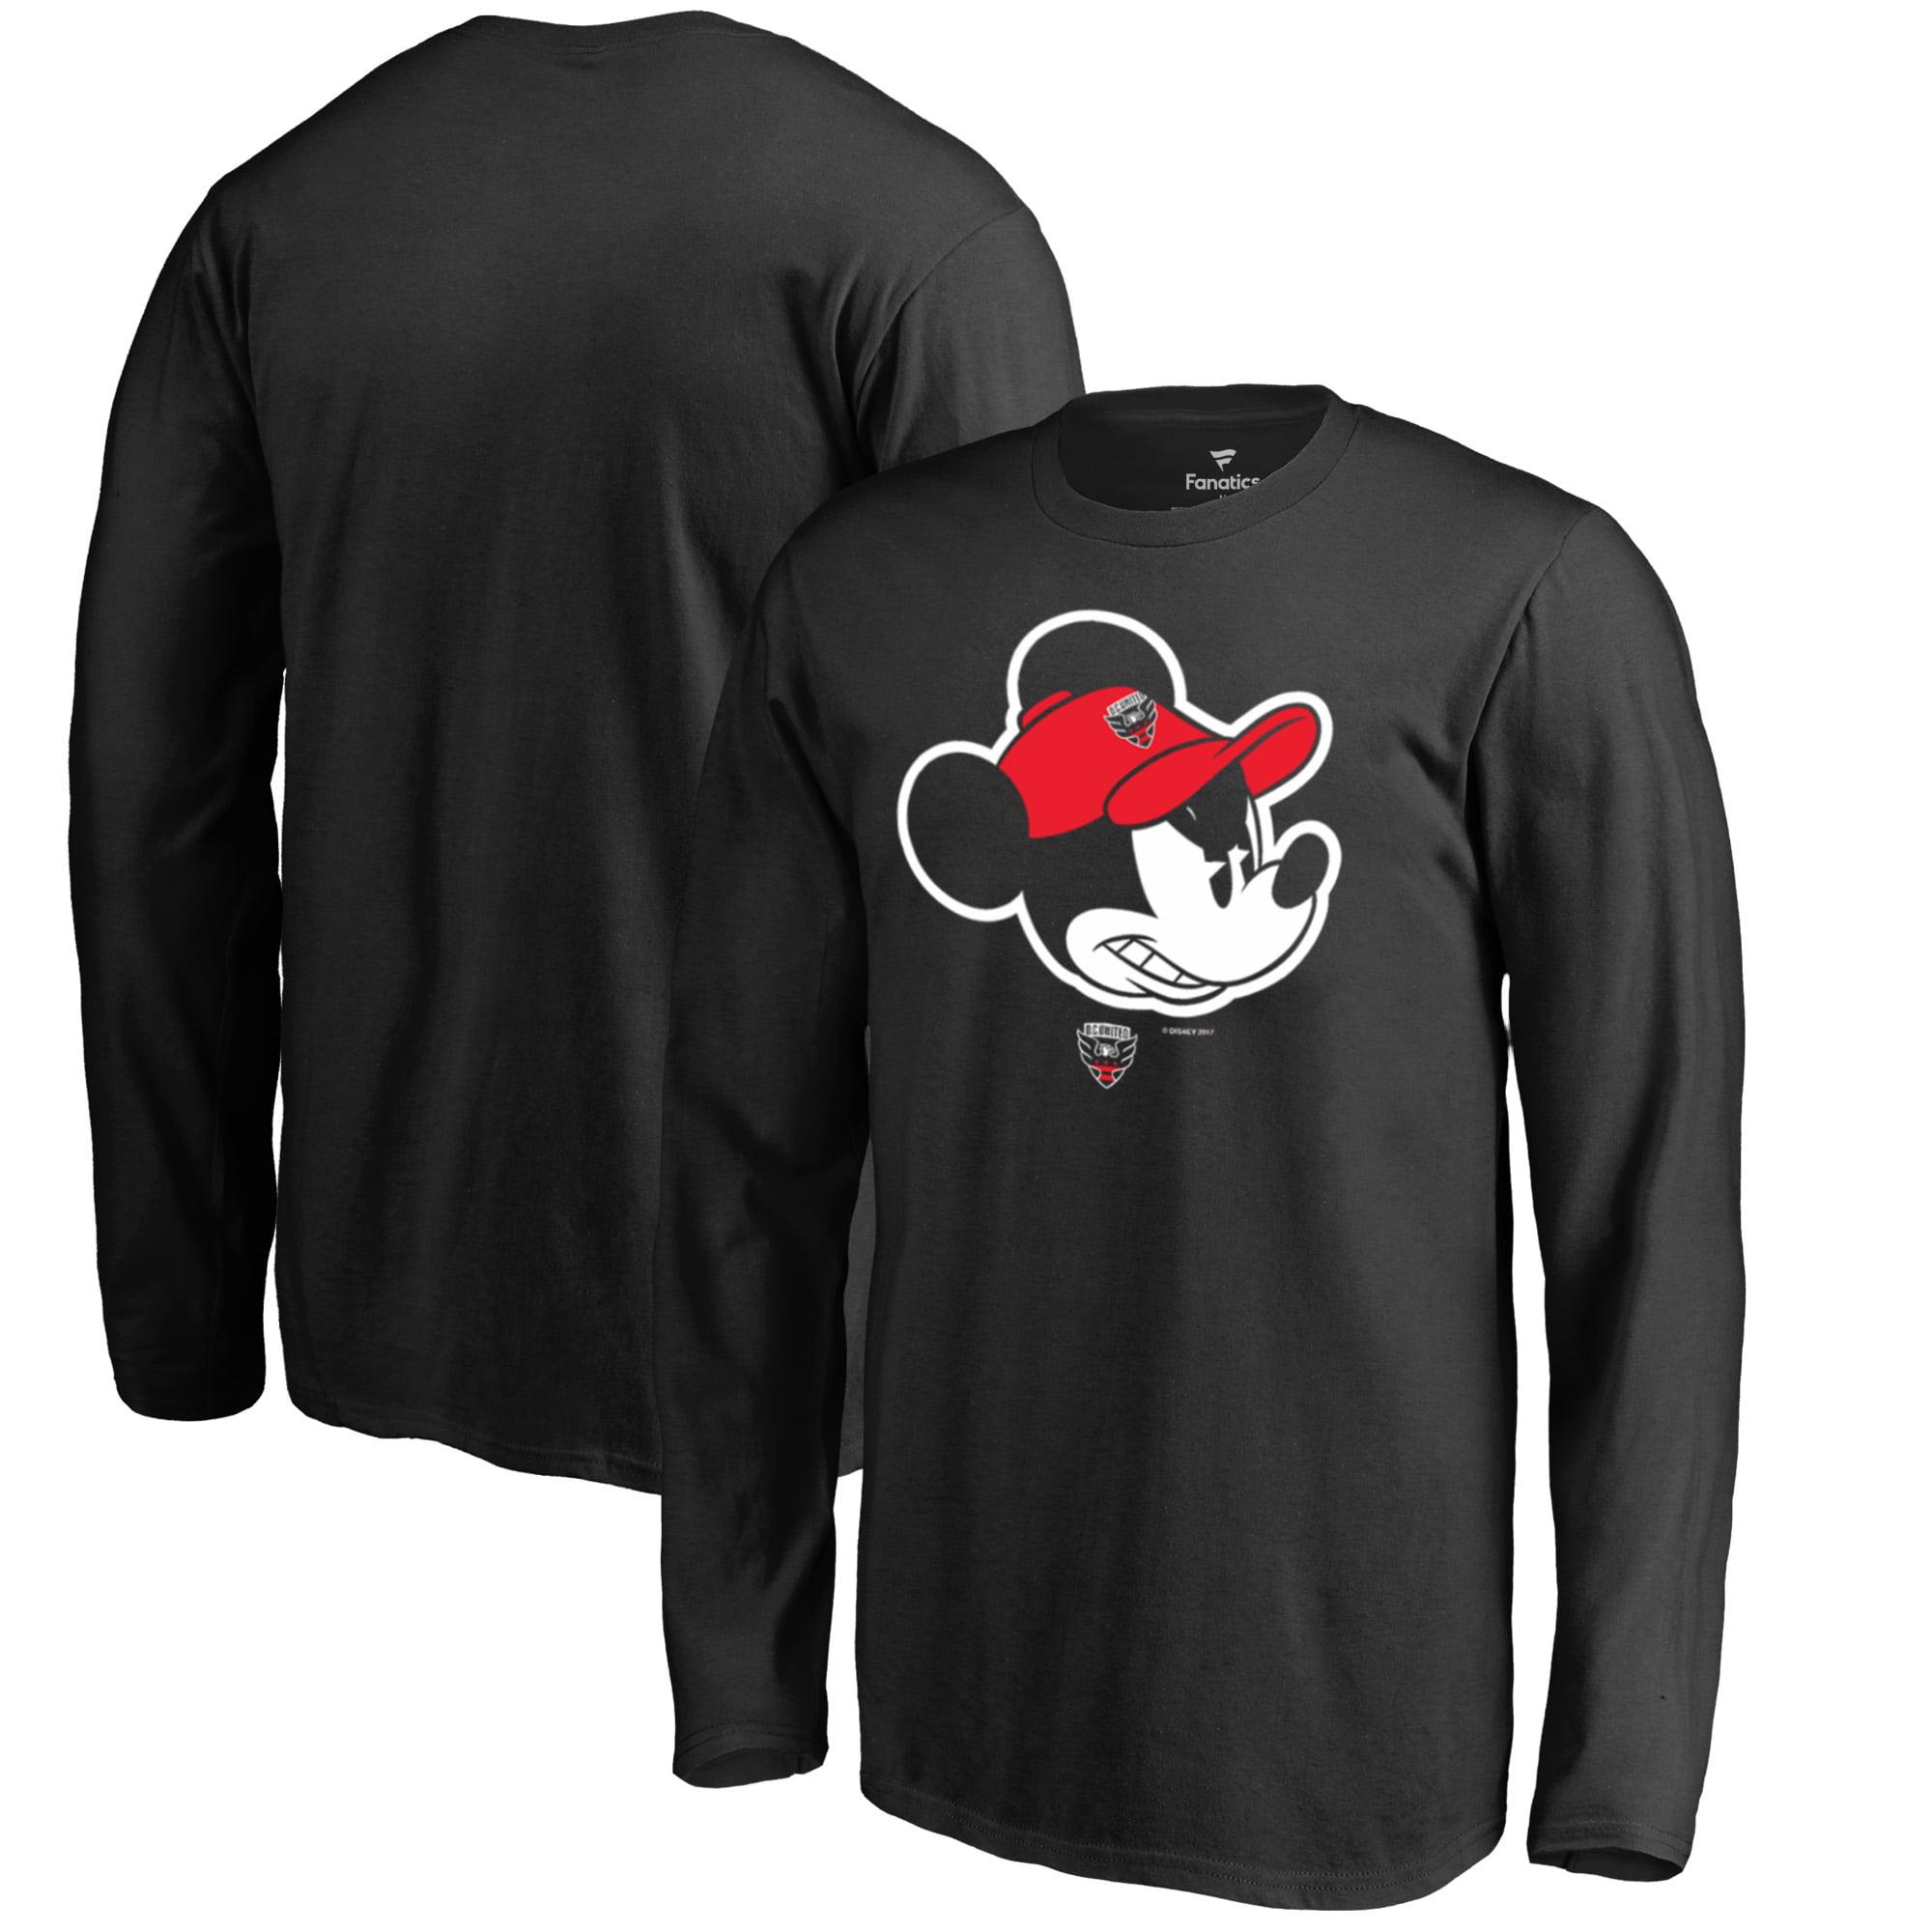 D.C. United Fanatics Branded Youth Disney Game Face Long Sleeve T-Shirt - Black